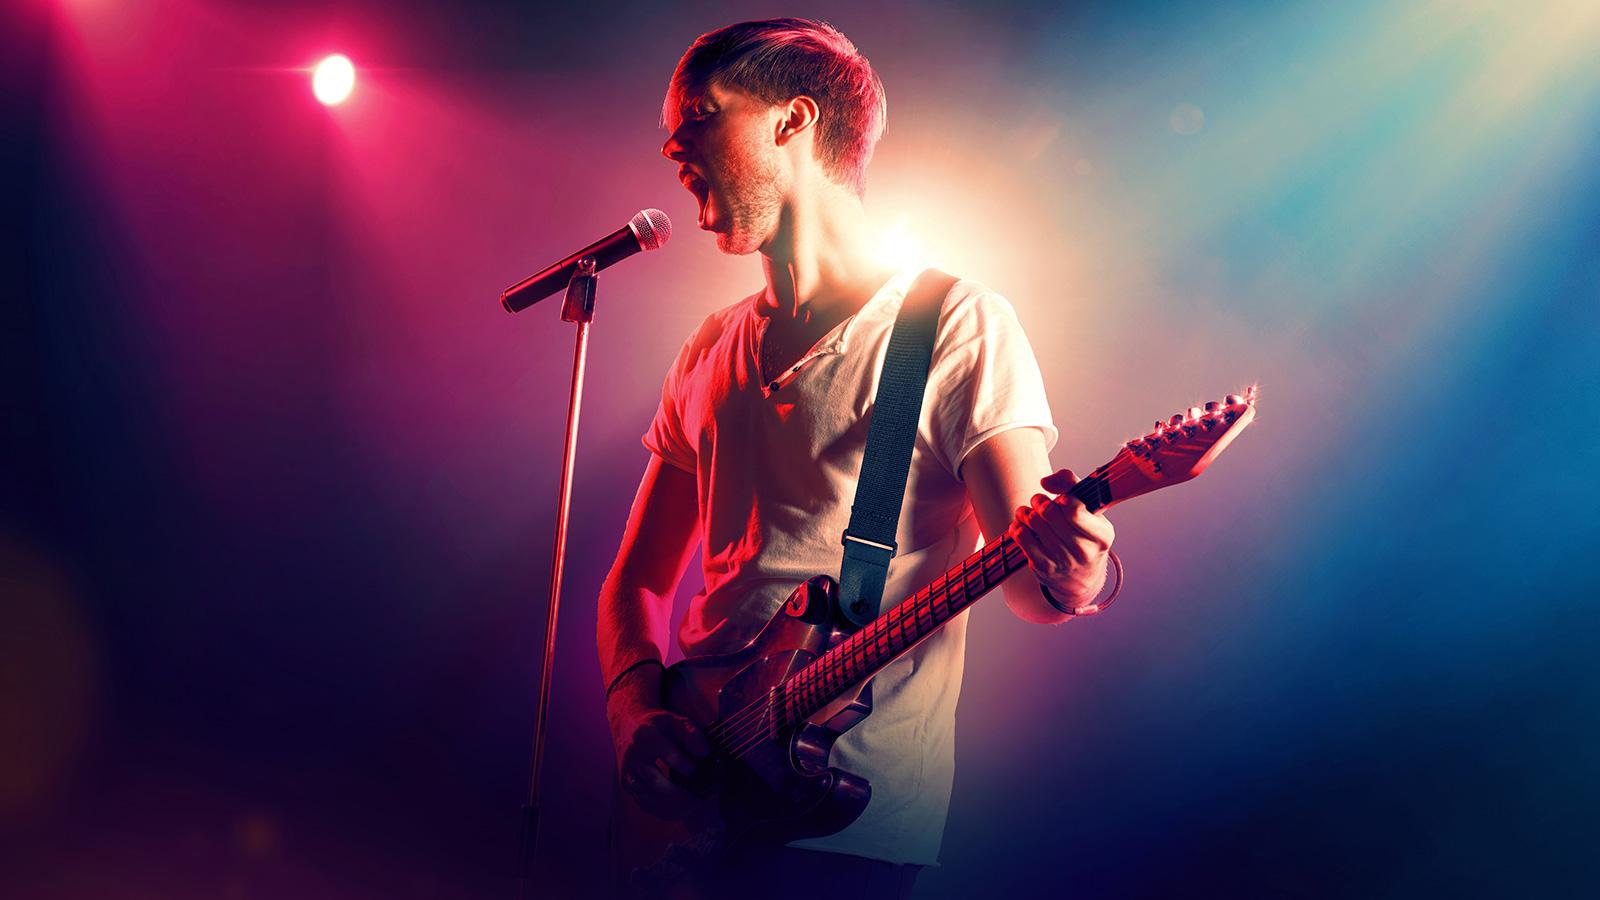 singer-guitar